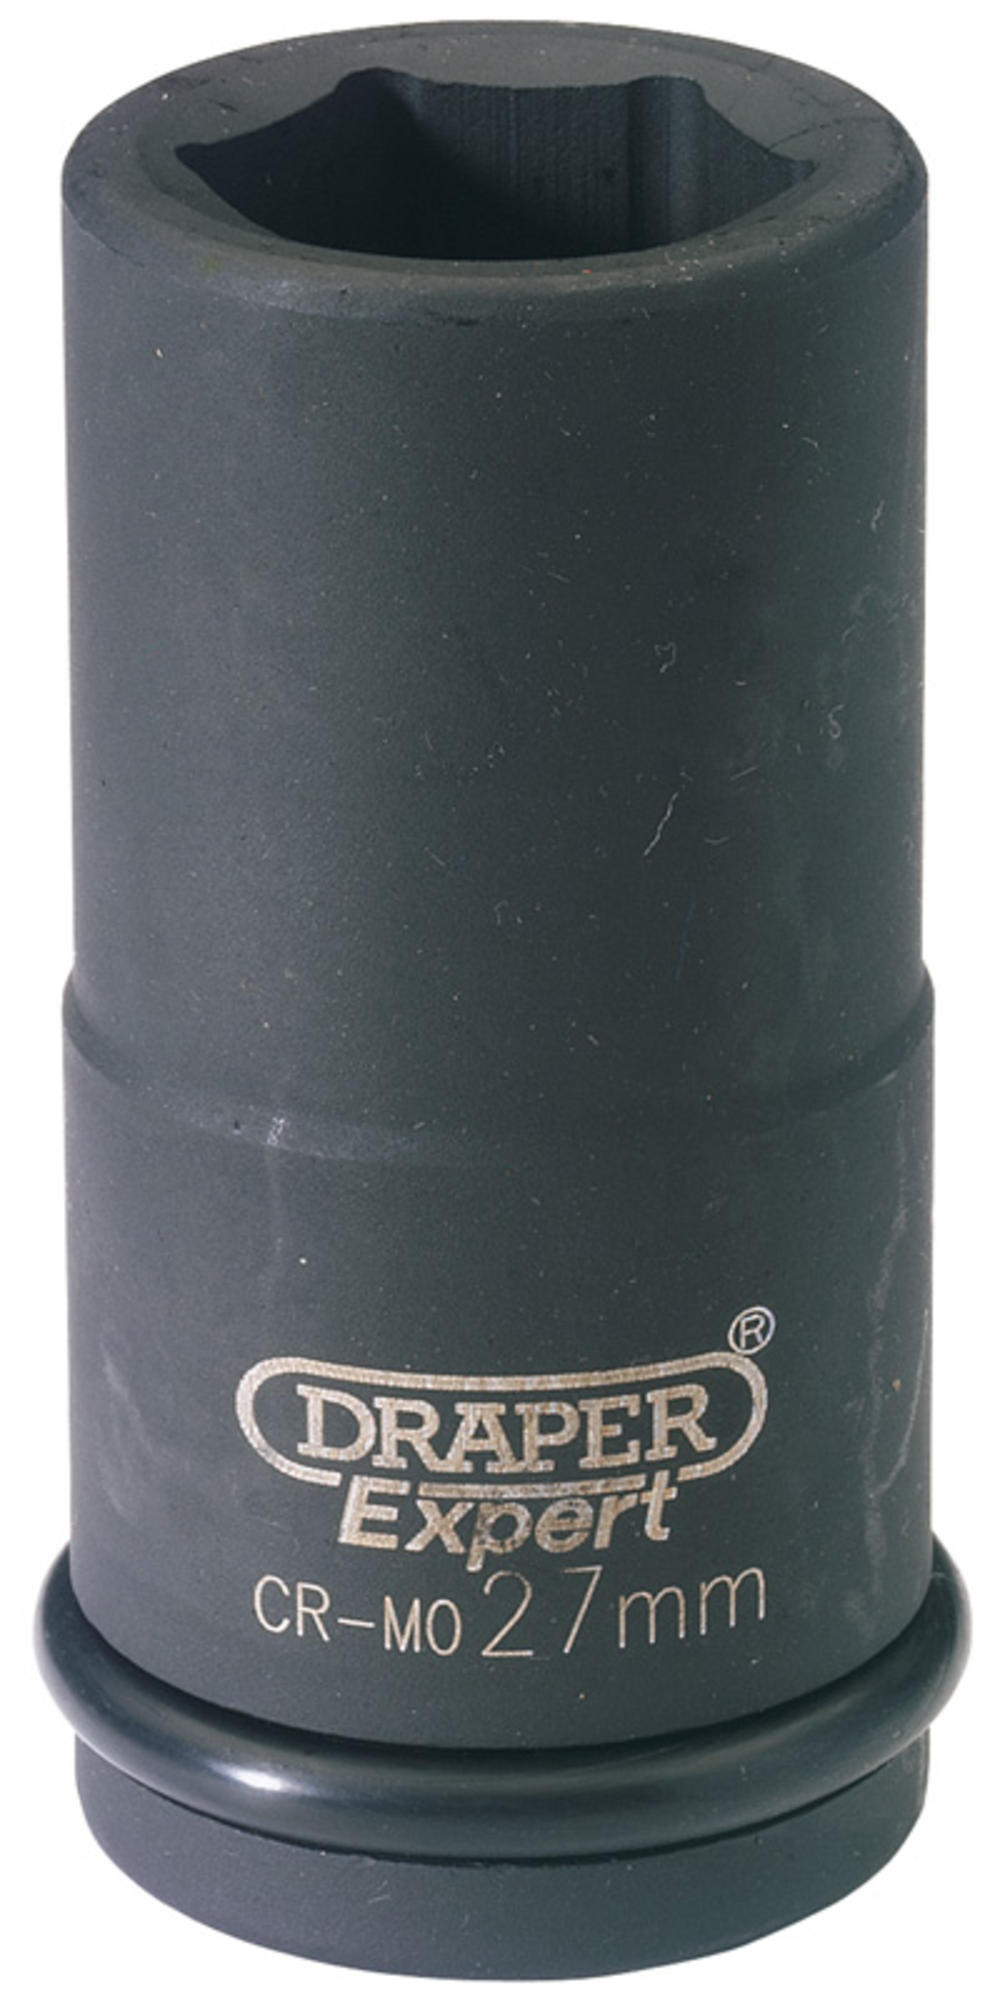 "Draper 71940 419D-MM Expert 36mm 3/4"" Square Drive Hi-Torq 6 Point Deep Impact Socket"